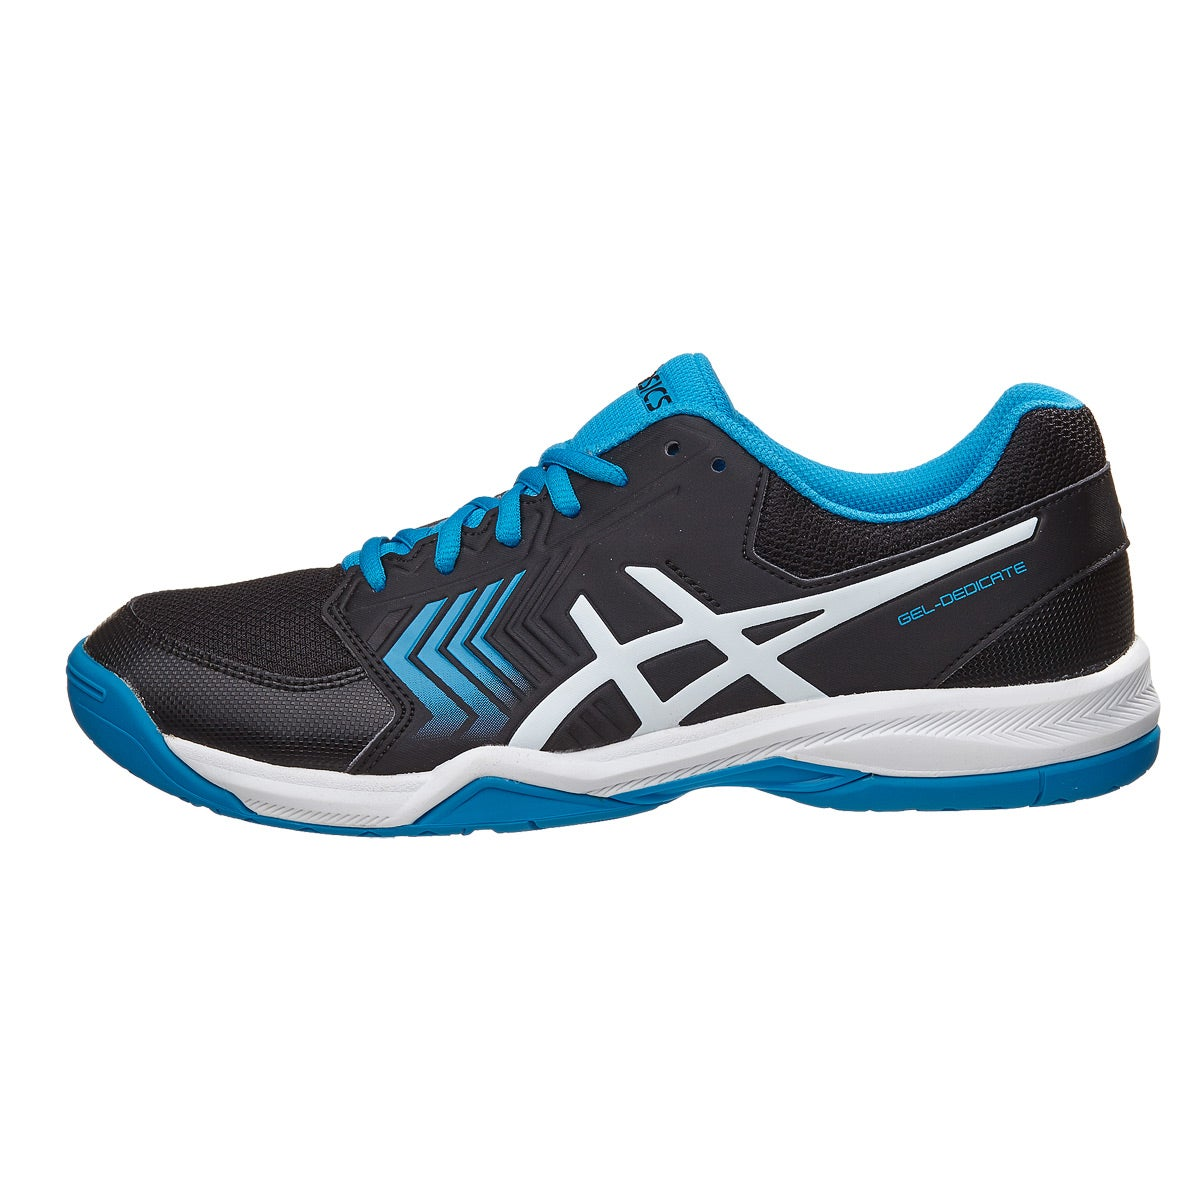 Tennis Warehouse Shoes Asics